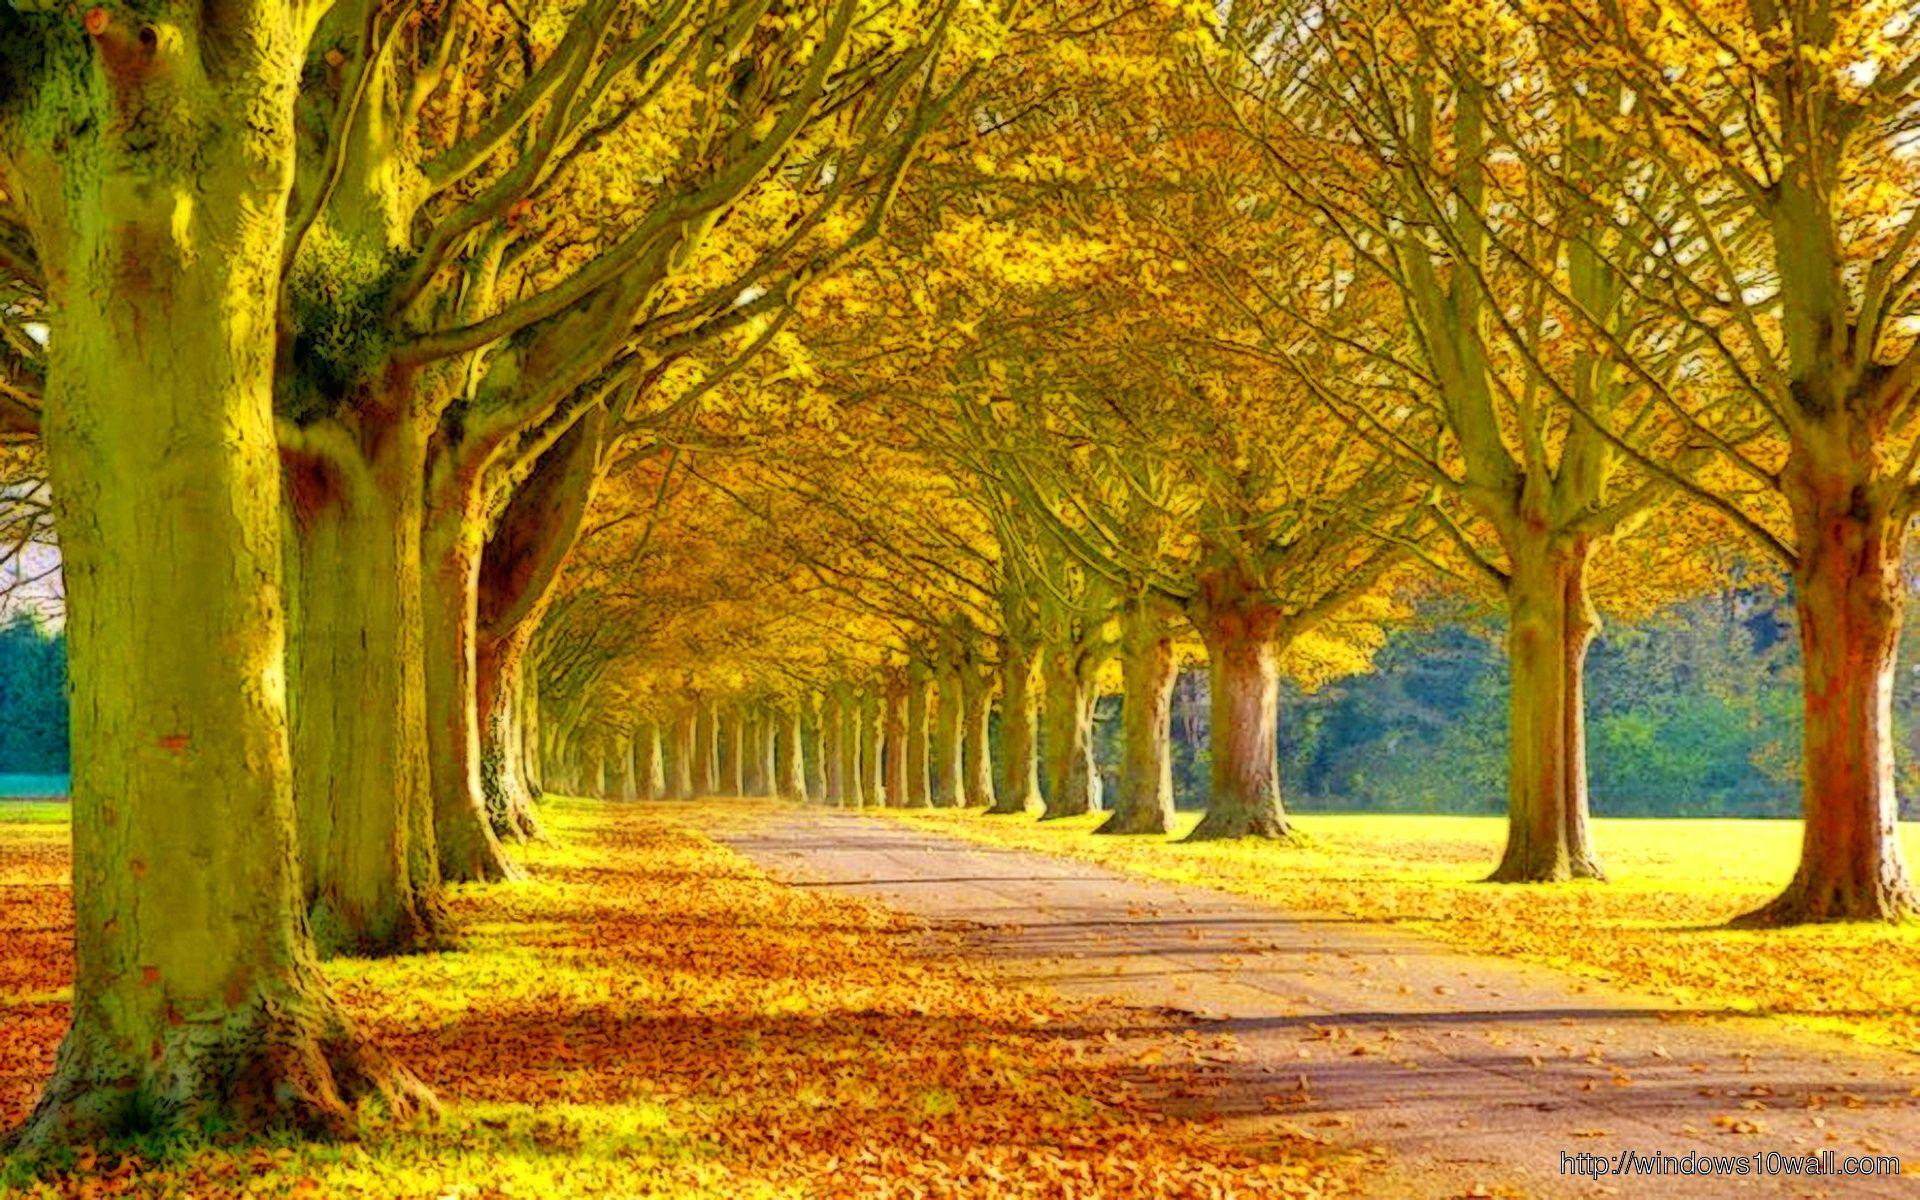 Windows 10 Wallpaper Autumn Mywallpapers Site Scenery Background Scenery Wallpaper Beautiful Scenery Wallpaper